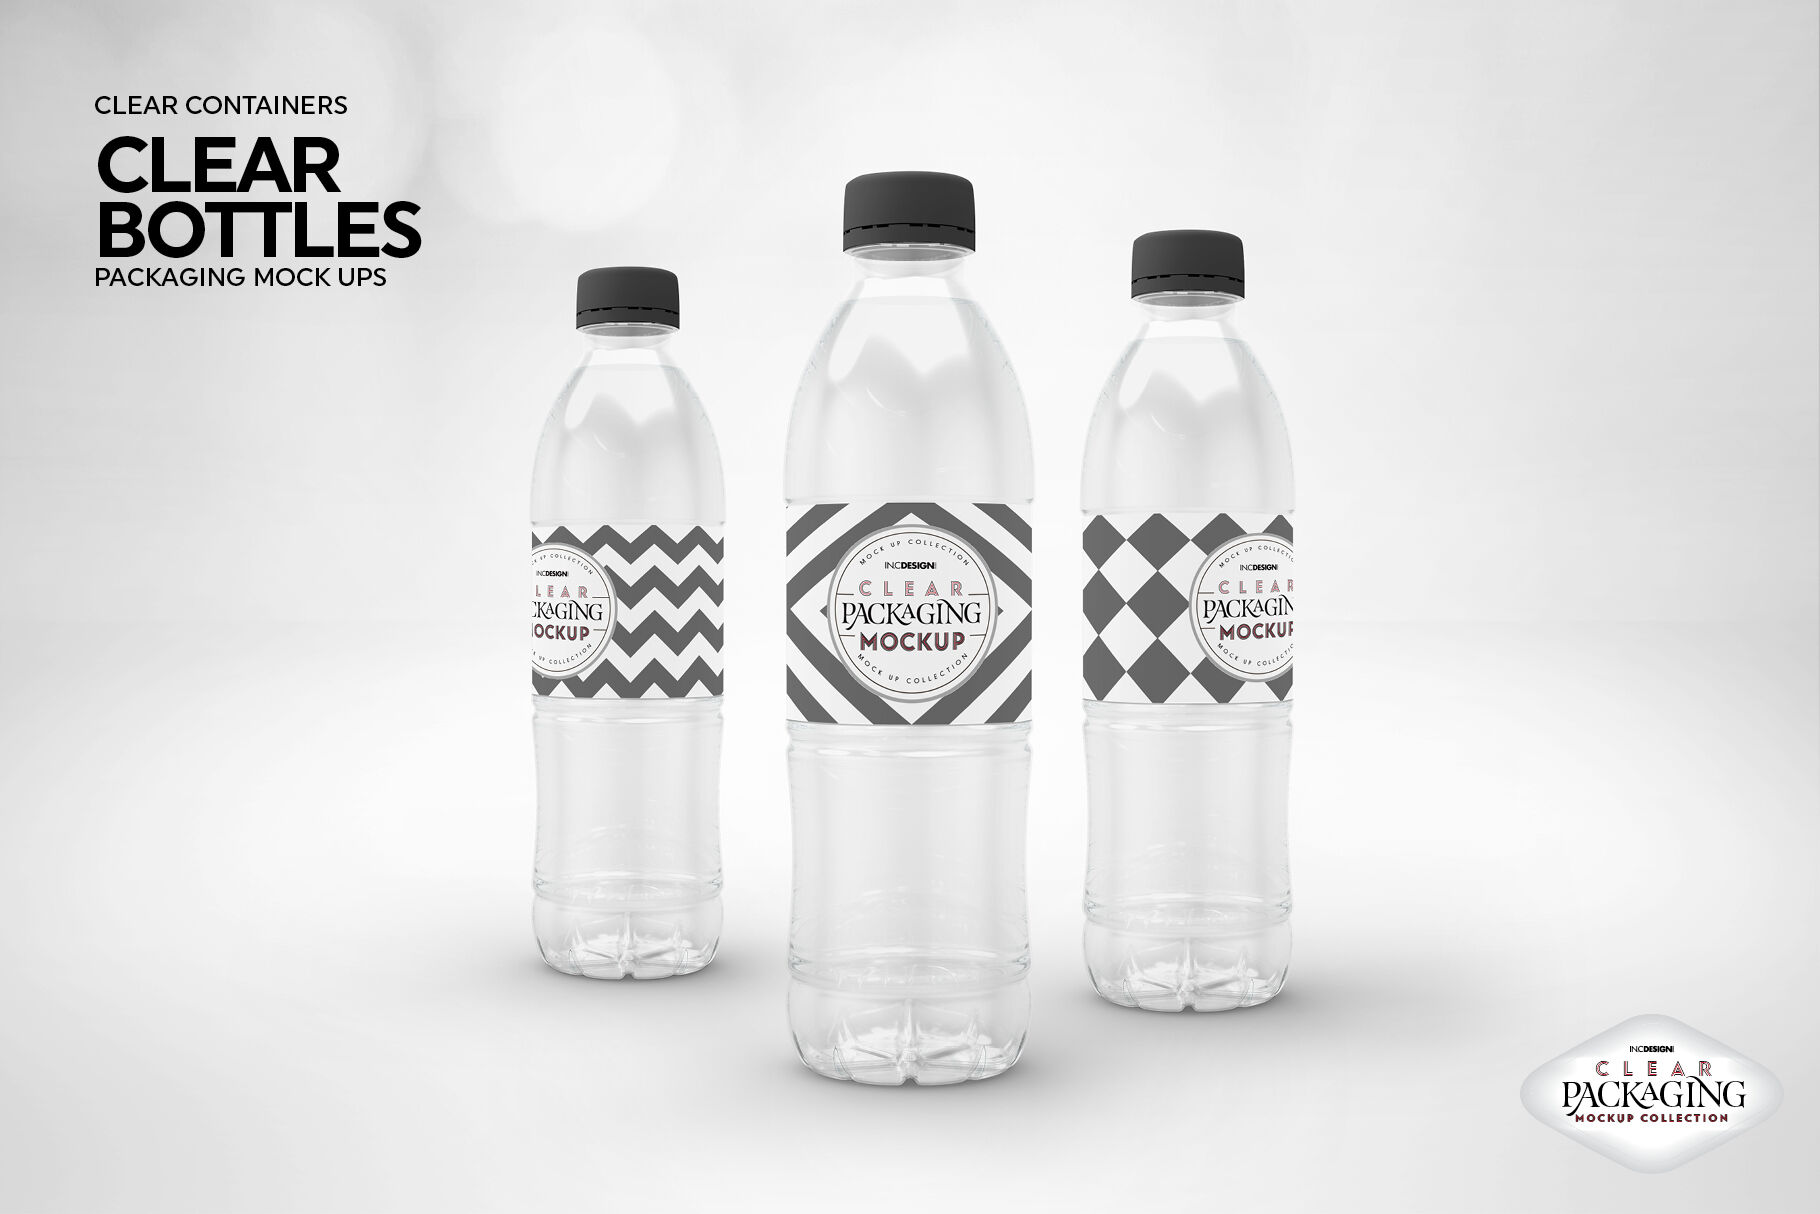 Clear Water Bottles Packaging Mockup By Inc Design Studio